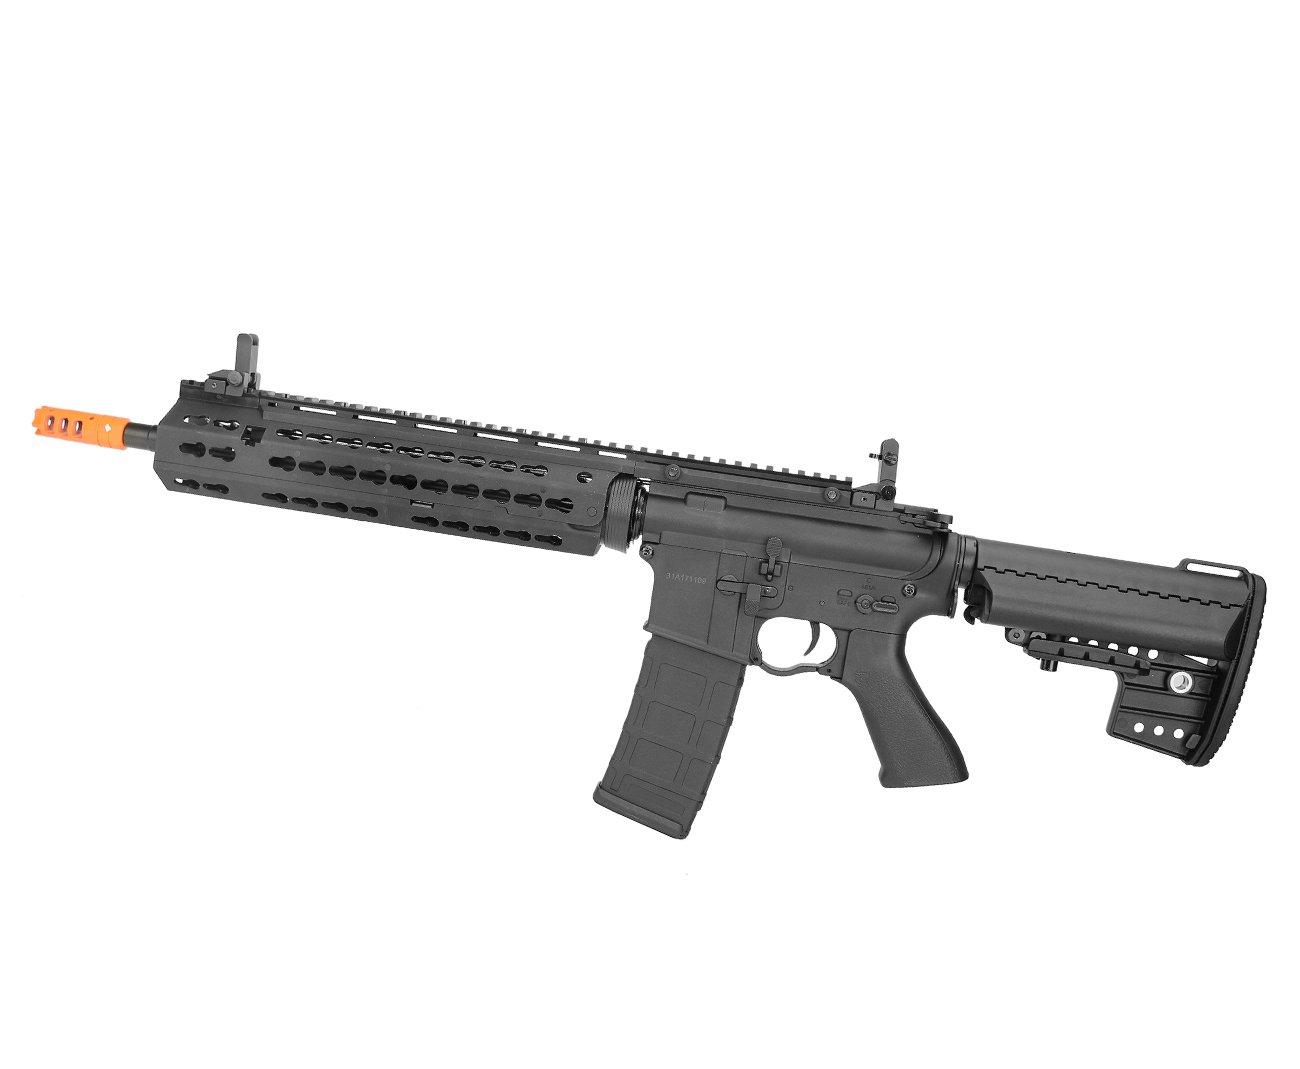 Rifle De Airsoft Cyma M4 Long Keymod Cm619 Bivolt Cal 6.0mm Cyma